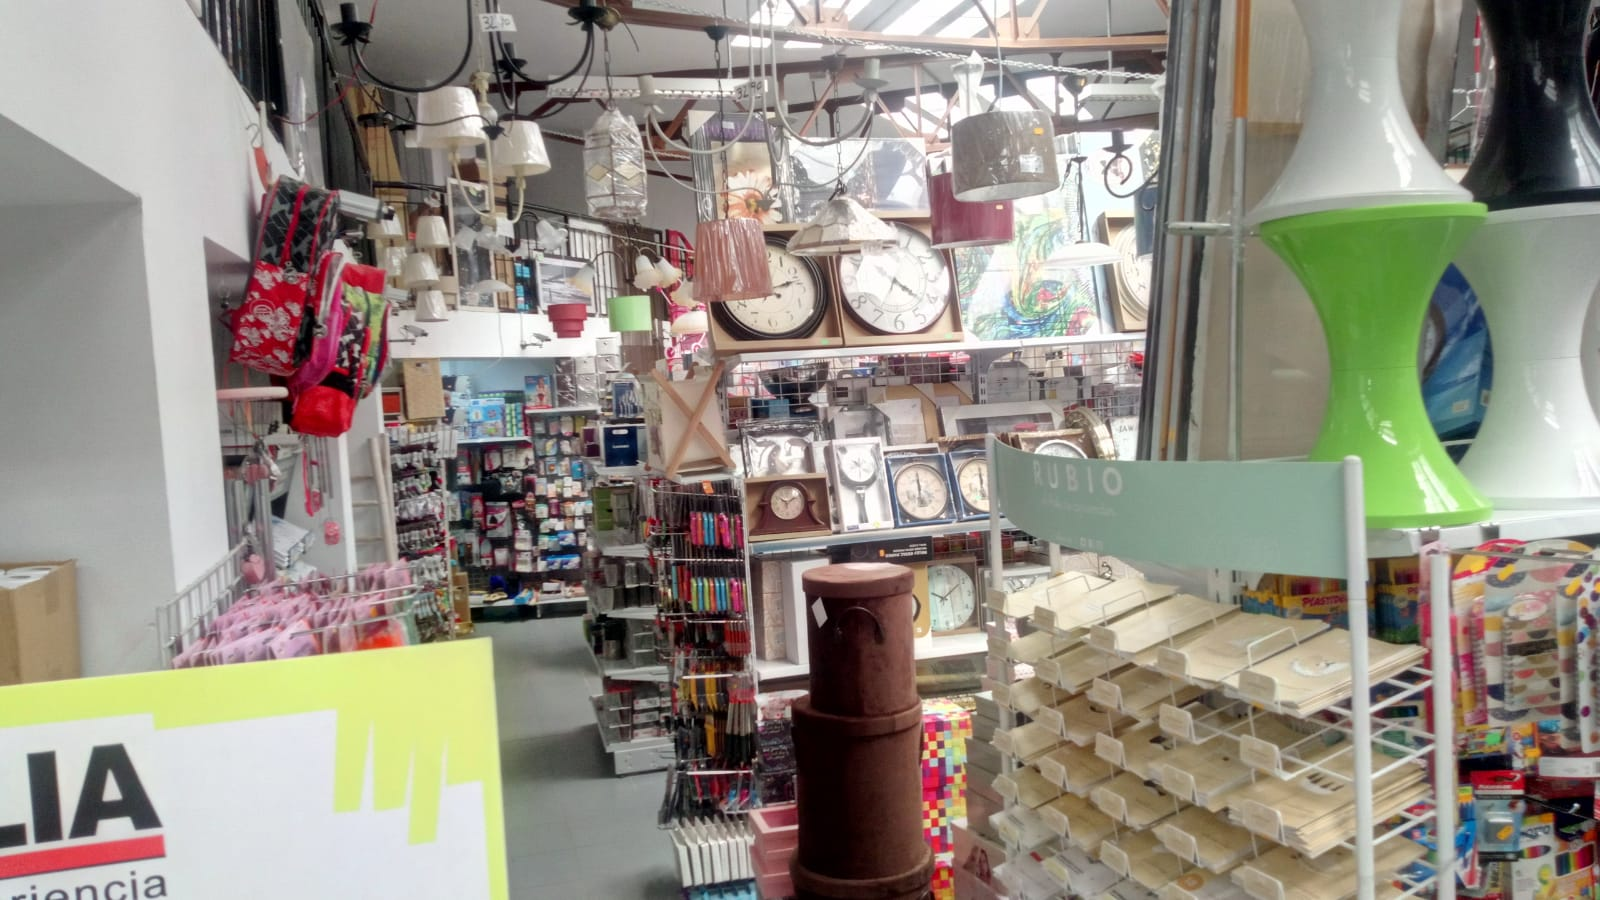 Almacen Bazar y electrónica en Mérida Badajoz SHOP CENTER